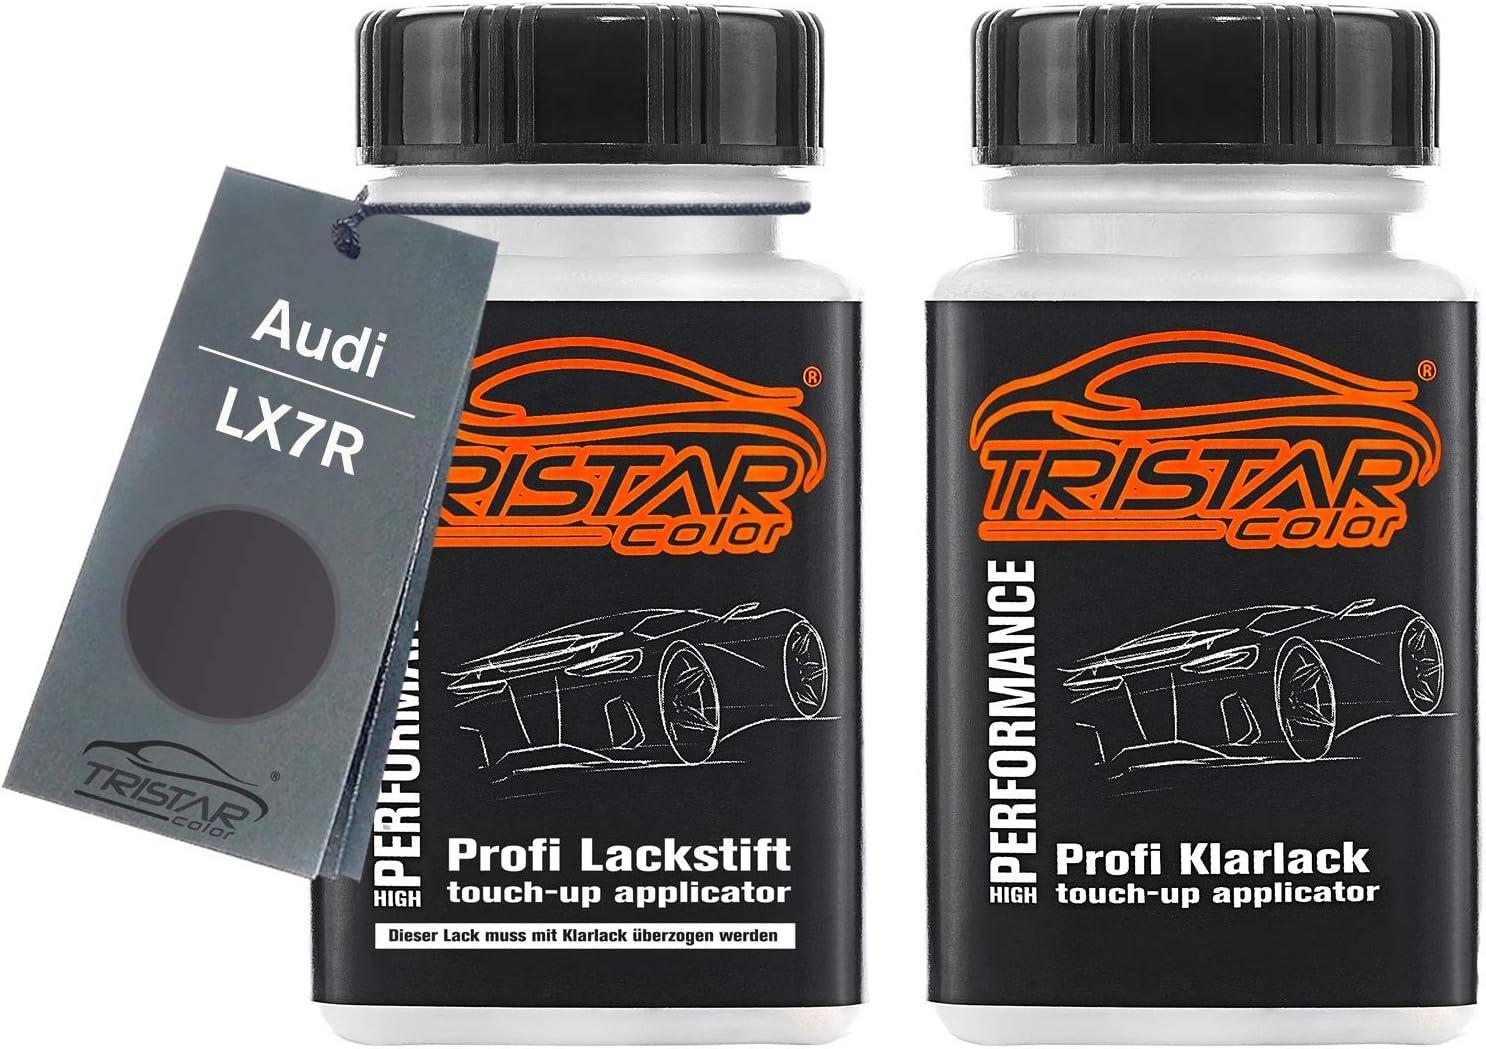 Tristarcolor Autolack Lackstift Set Für Audi Lx7r Monsungrau Metallic Basislack Klarlack Je 50ml Auto